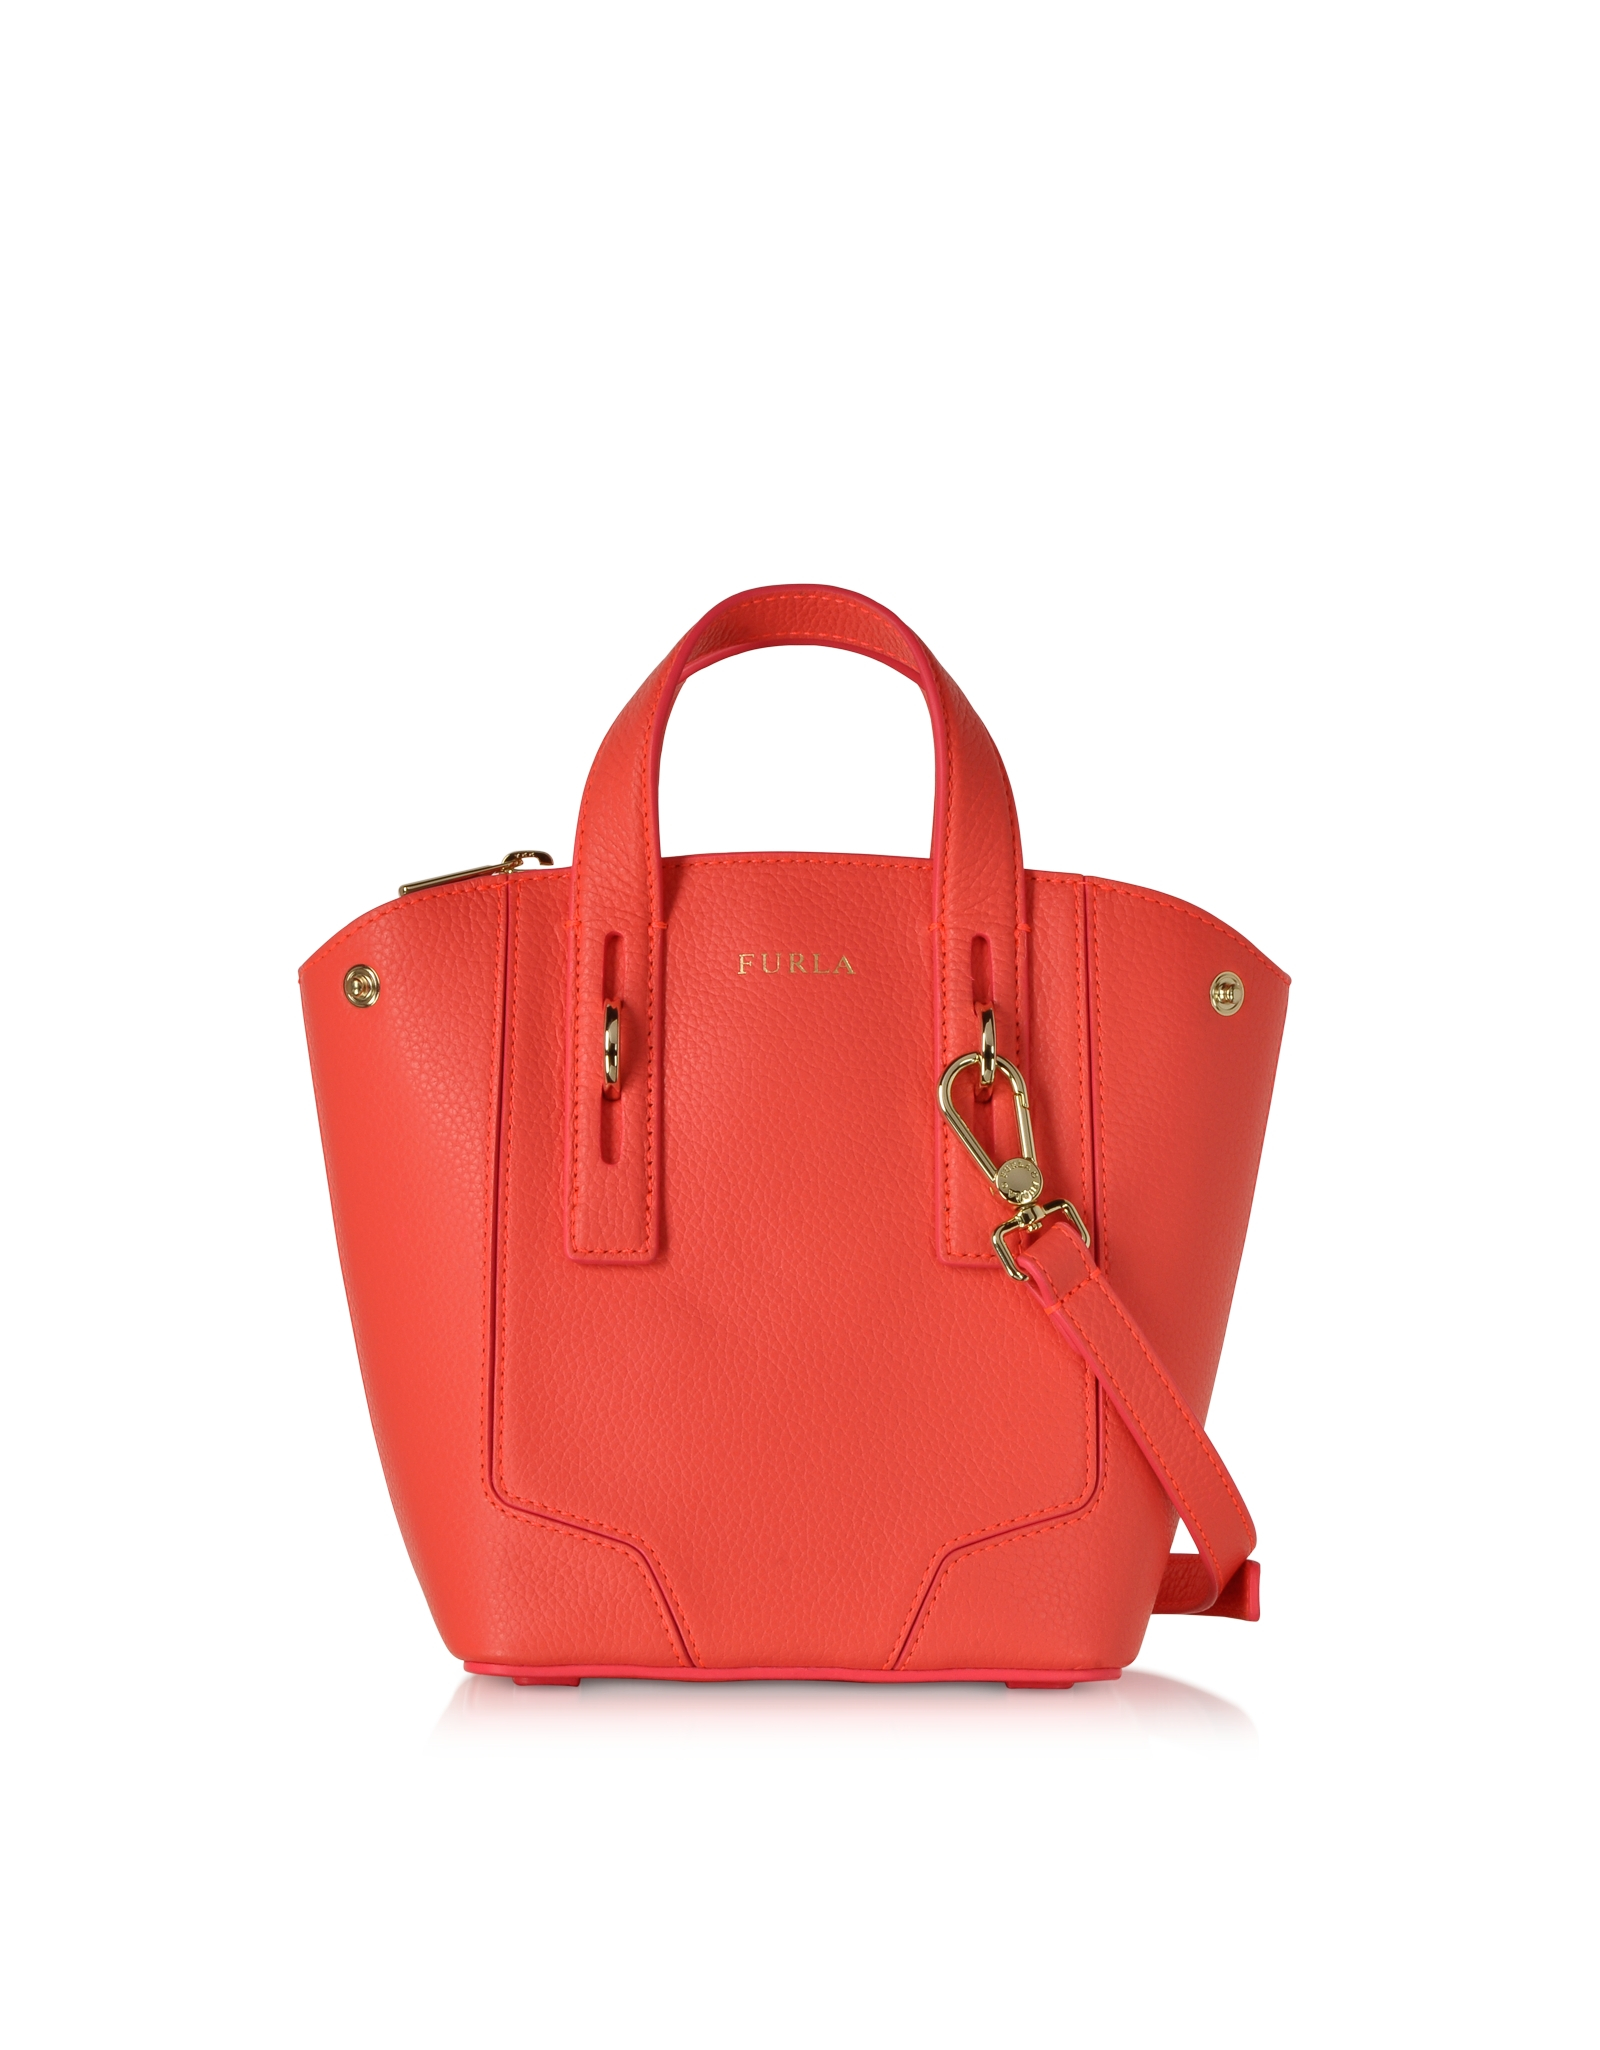 furla perla mini crossbody tote bag in orange lyst